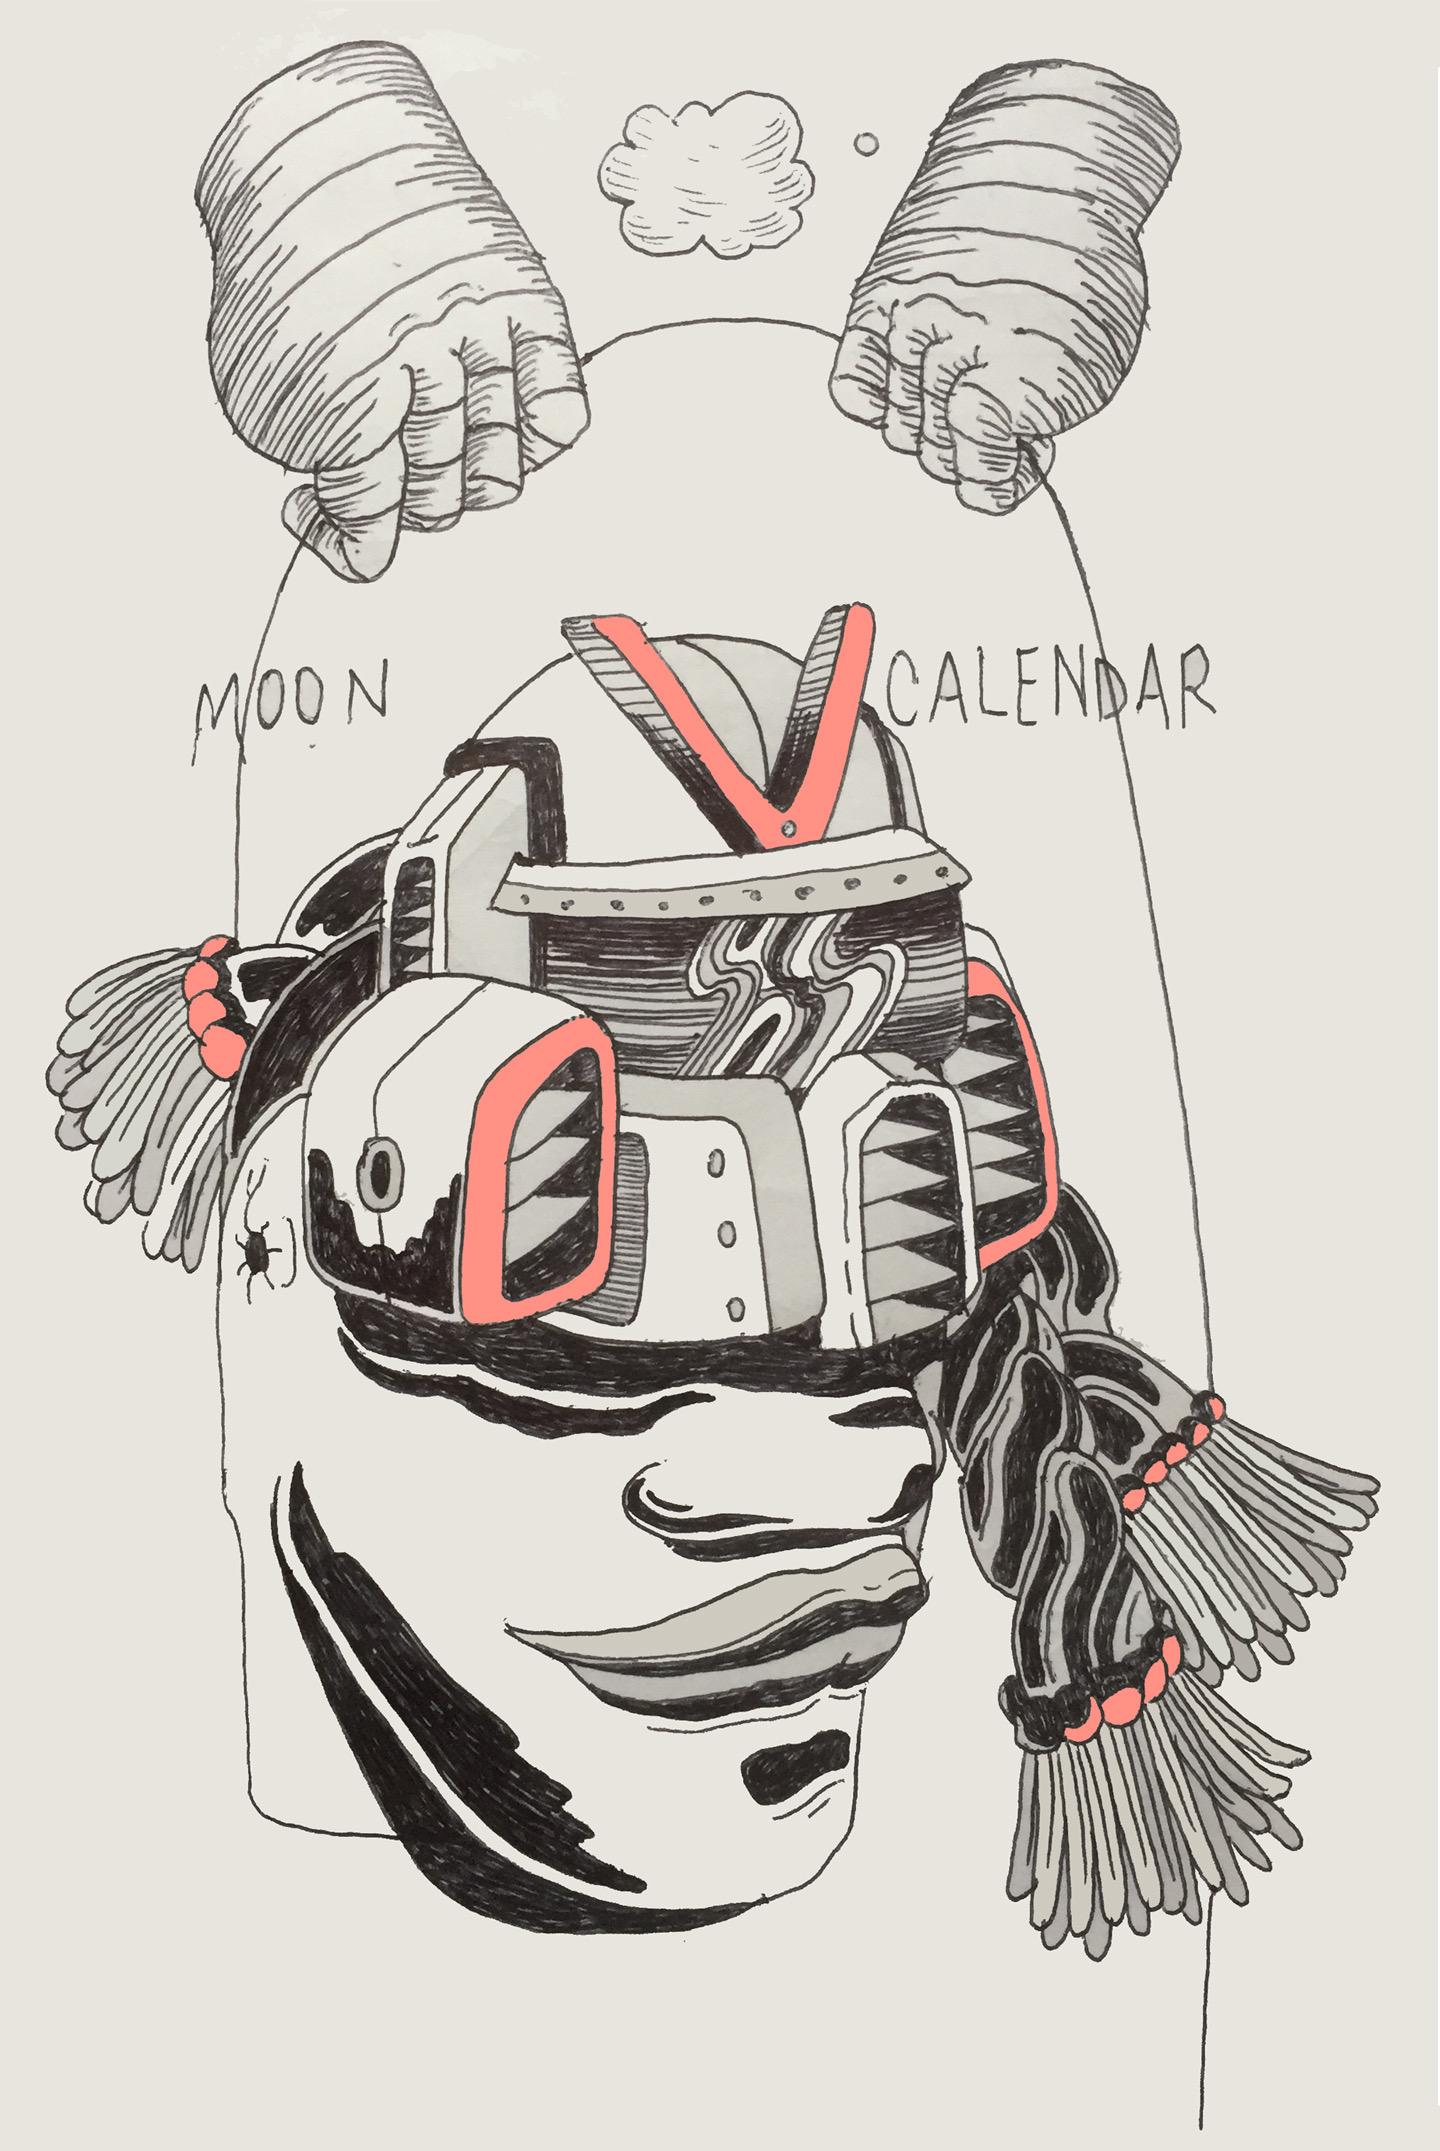 MoonCalendar2.jpg